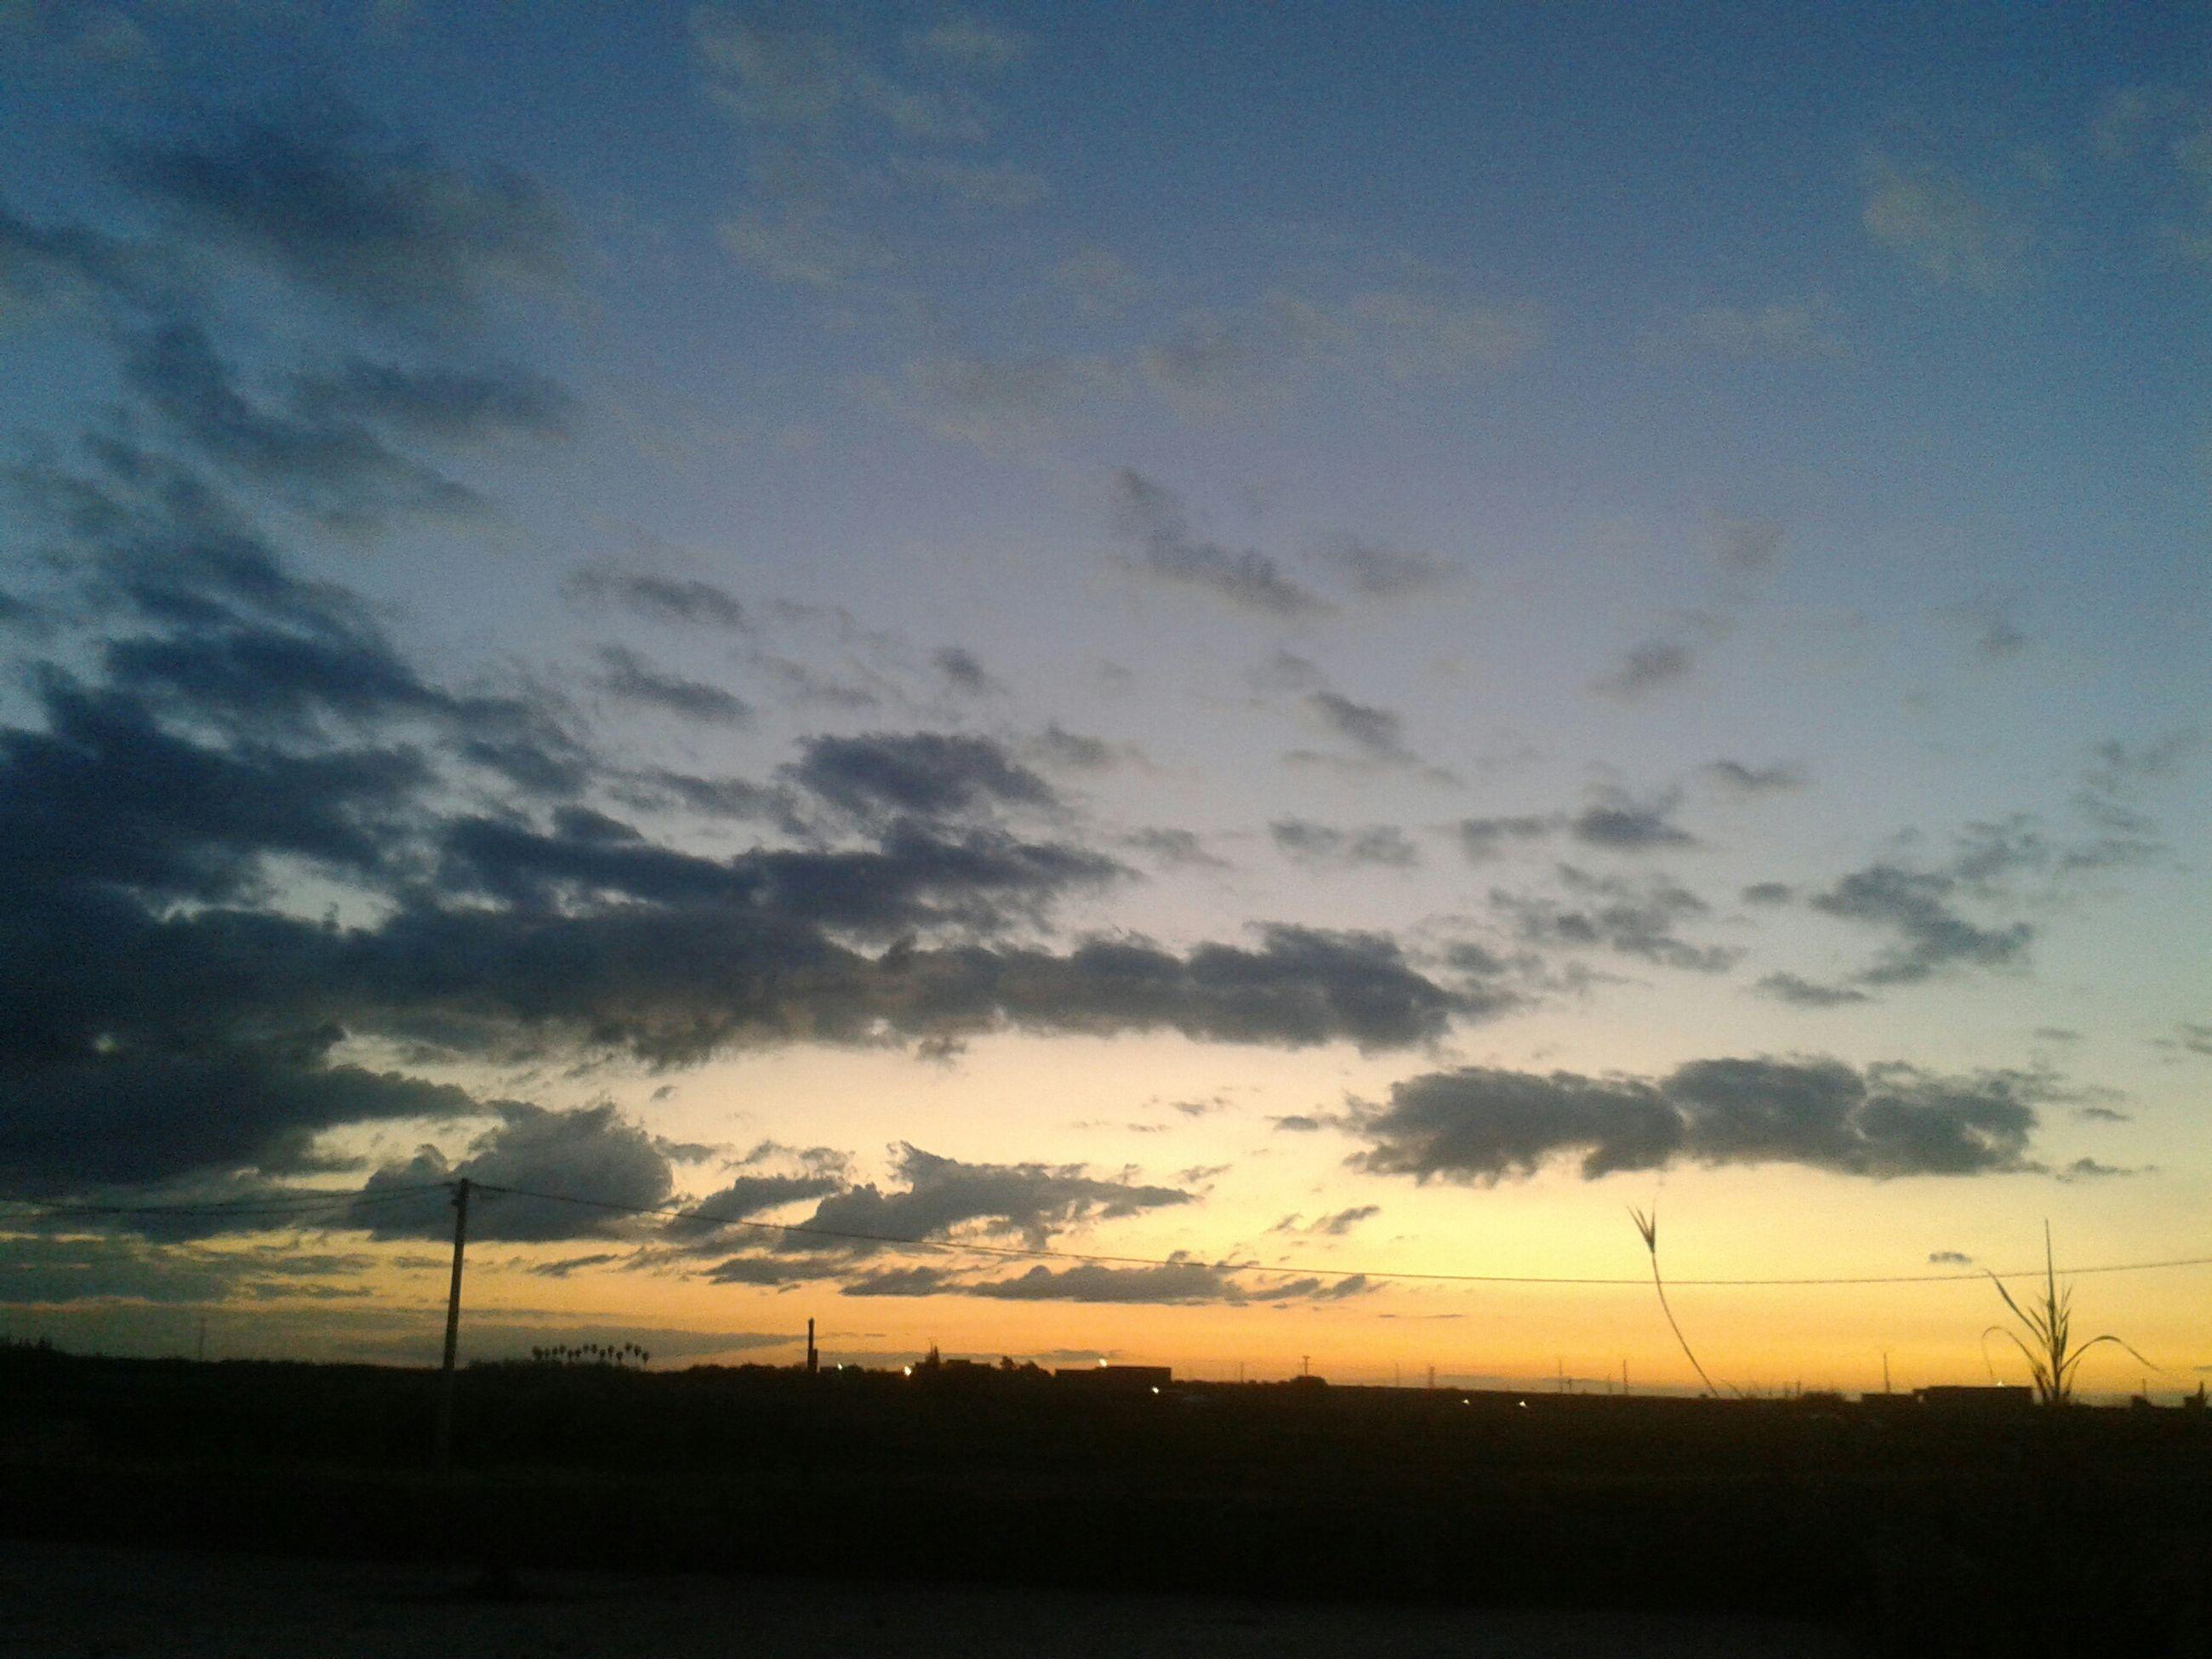 sunset, silhouette, sky, tranquil scene, tranquility, landscape, scenics, beauty in nature, cloud - sky, nature, field, electricity pylon, orange color, dusk, idyllic, dramatic sky, cloud, dark, outdoors, cloudy